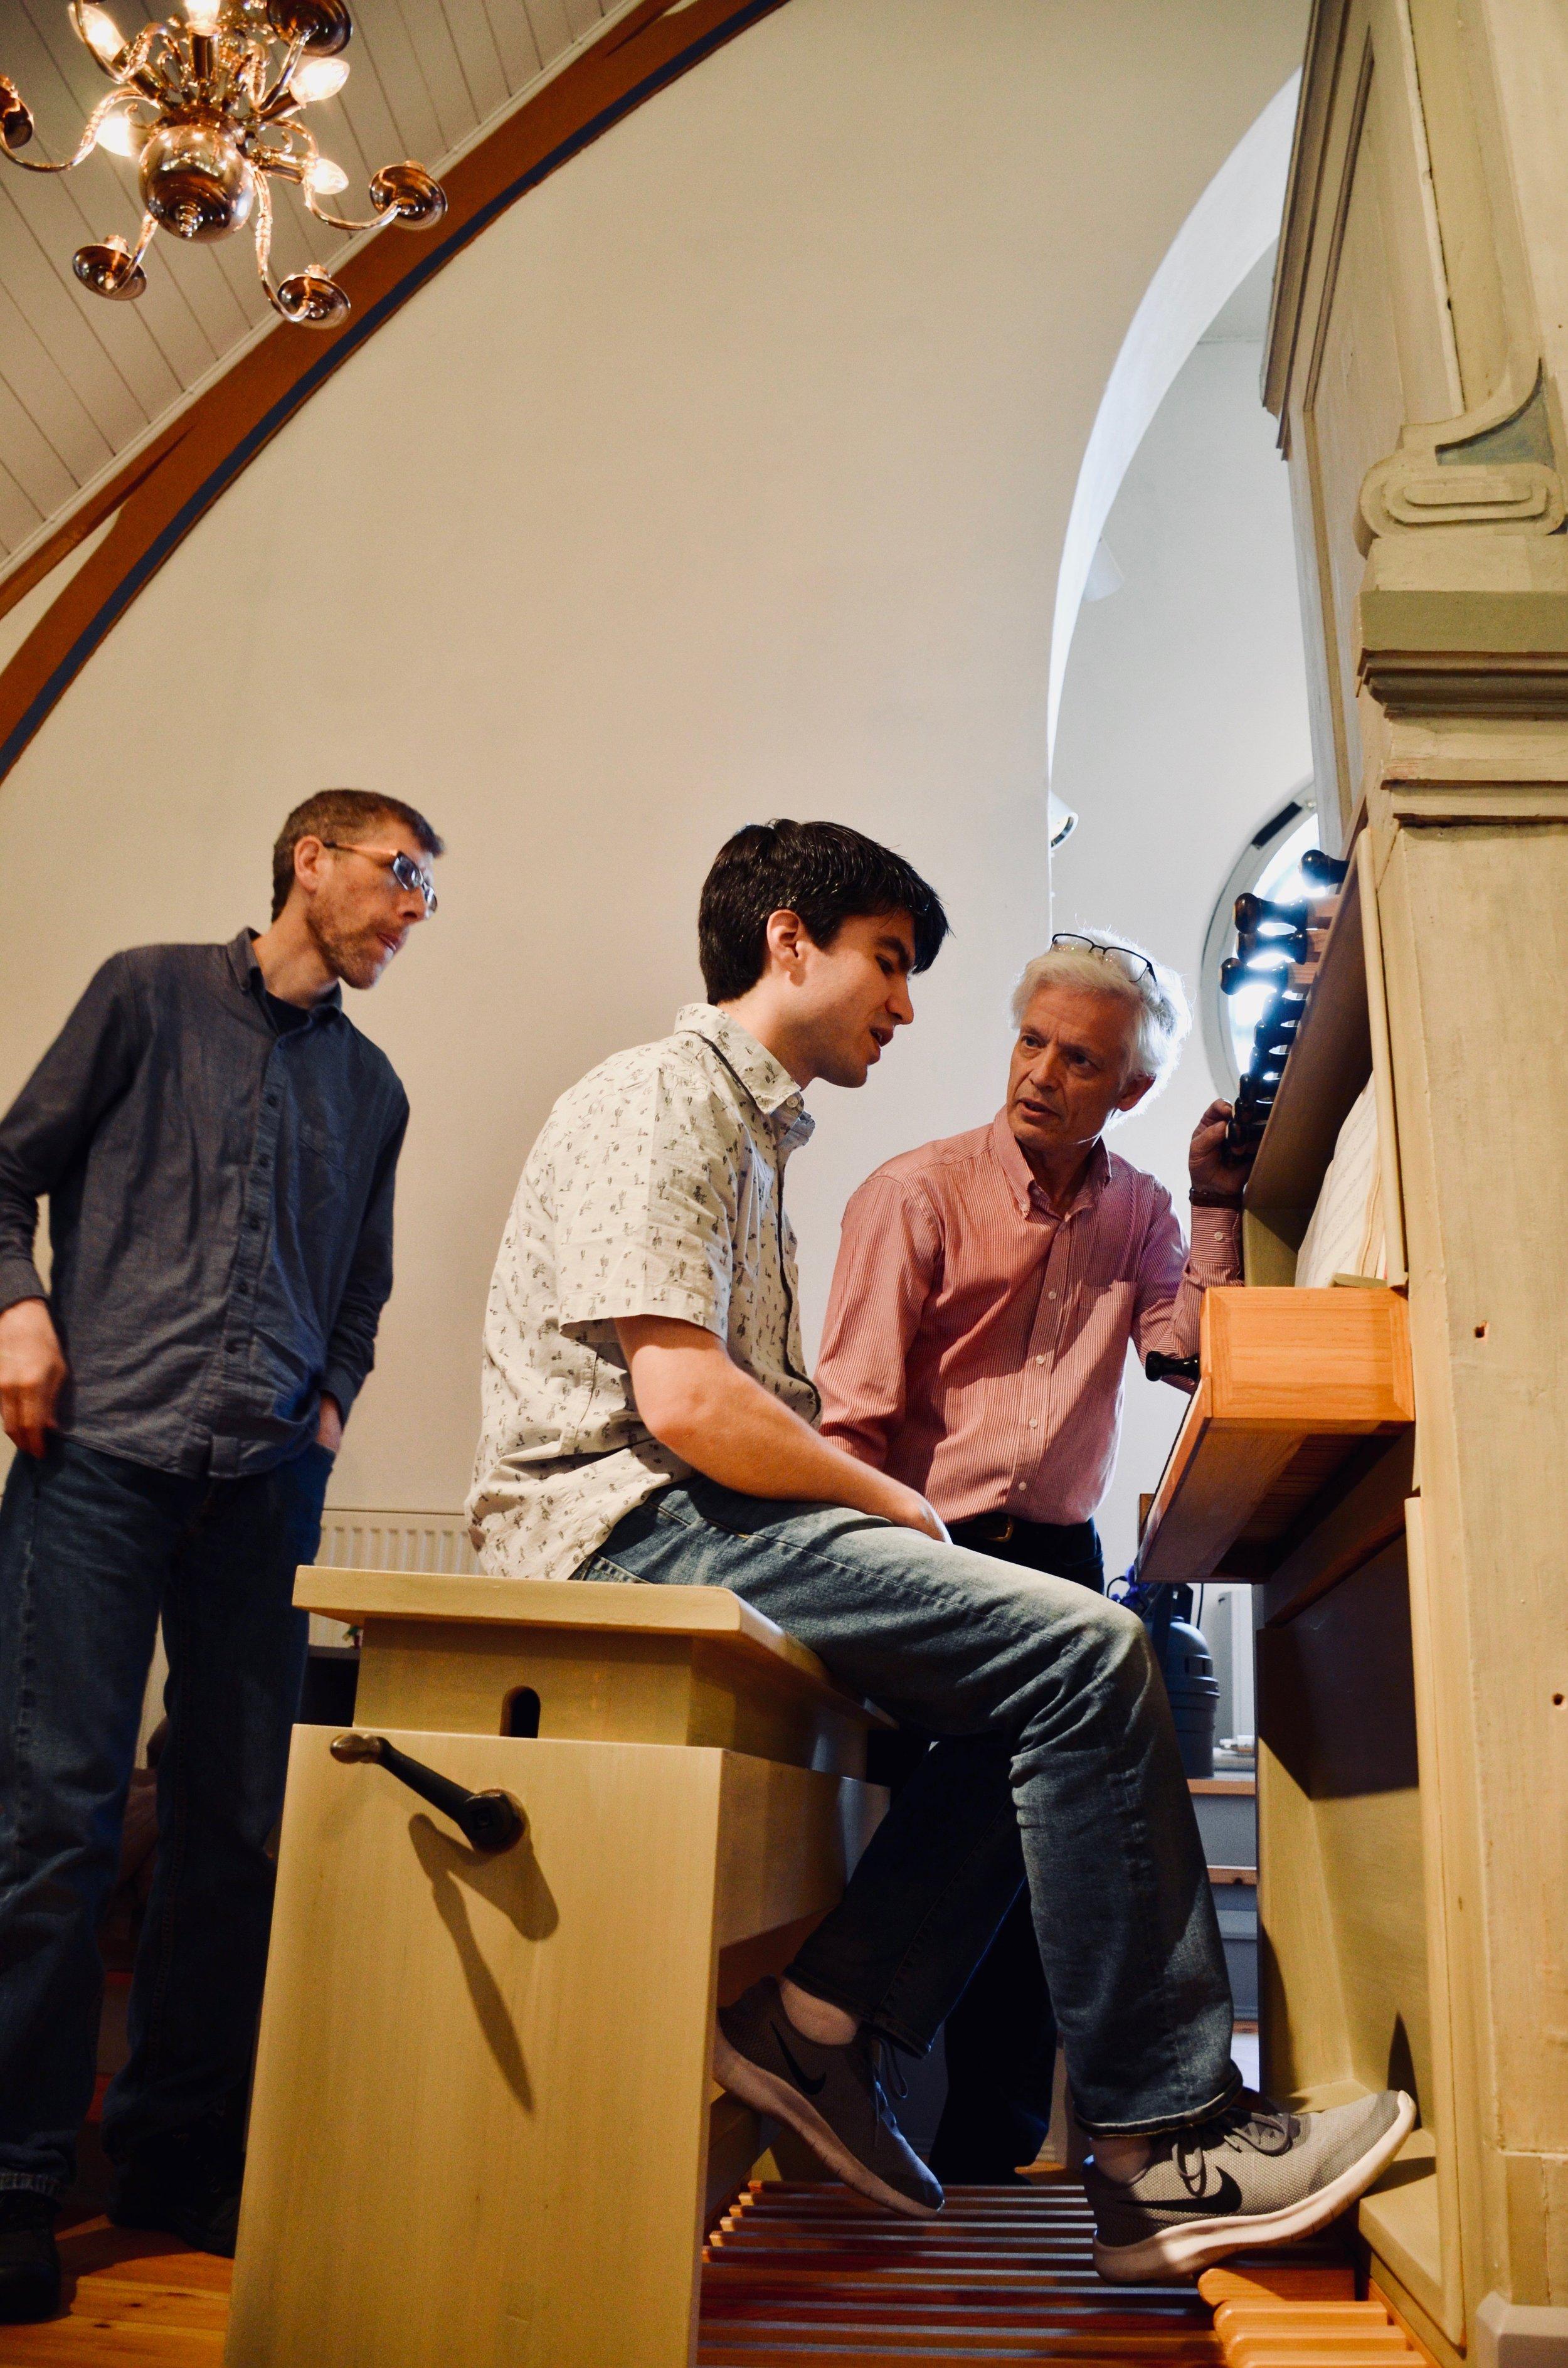 Hans Davidsson coaches Brandon Santini on the 1783 Schiörlin organ in Jonsered, Sweden.